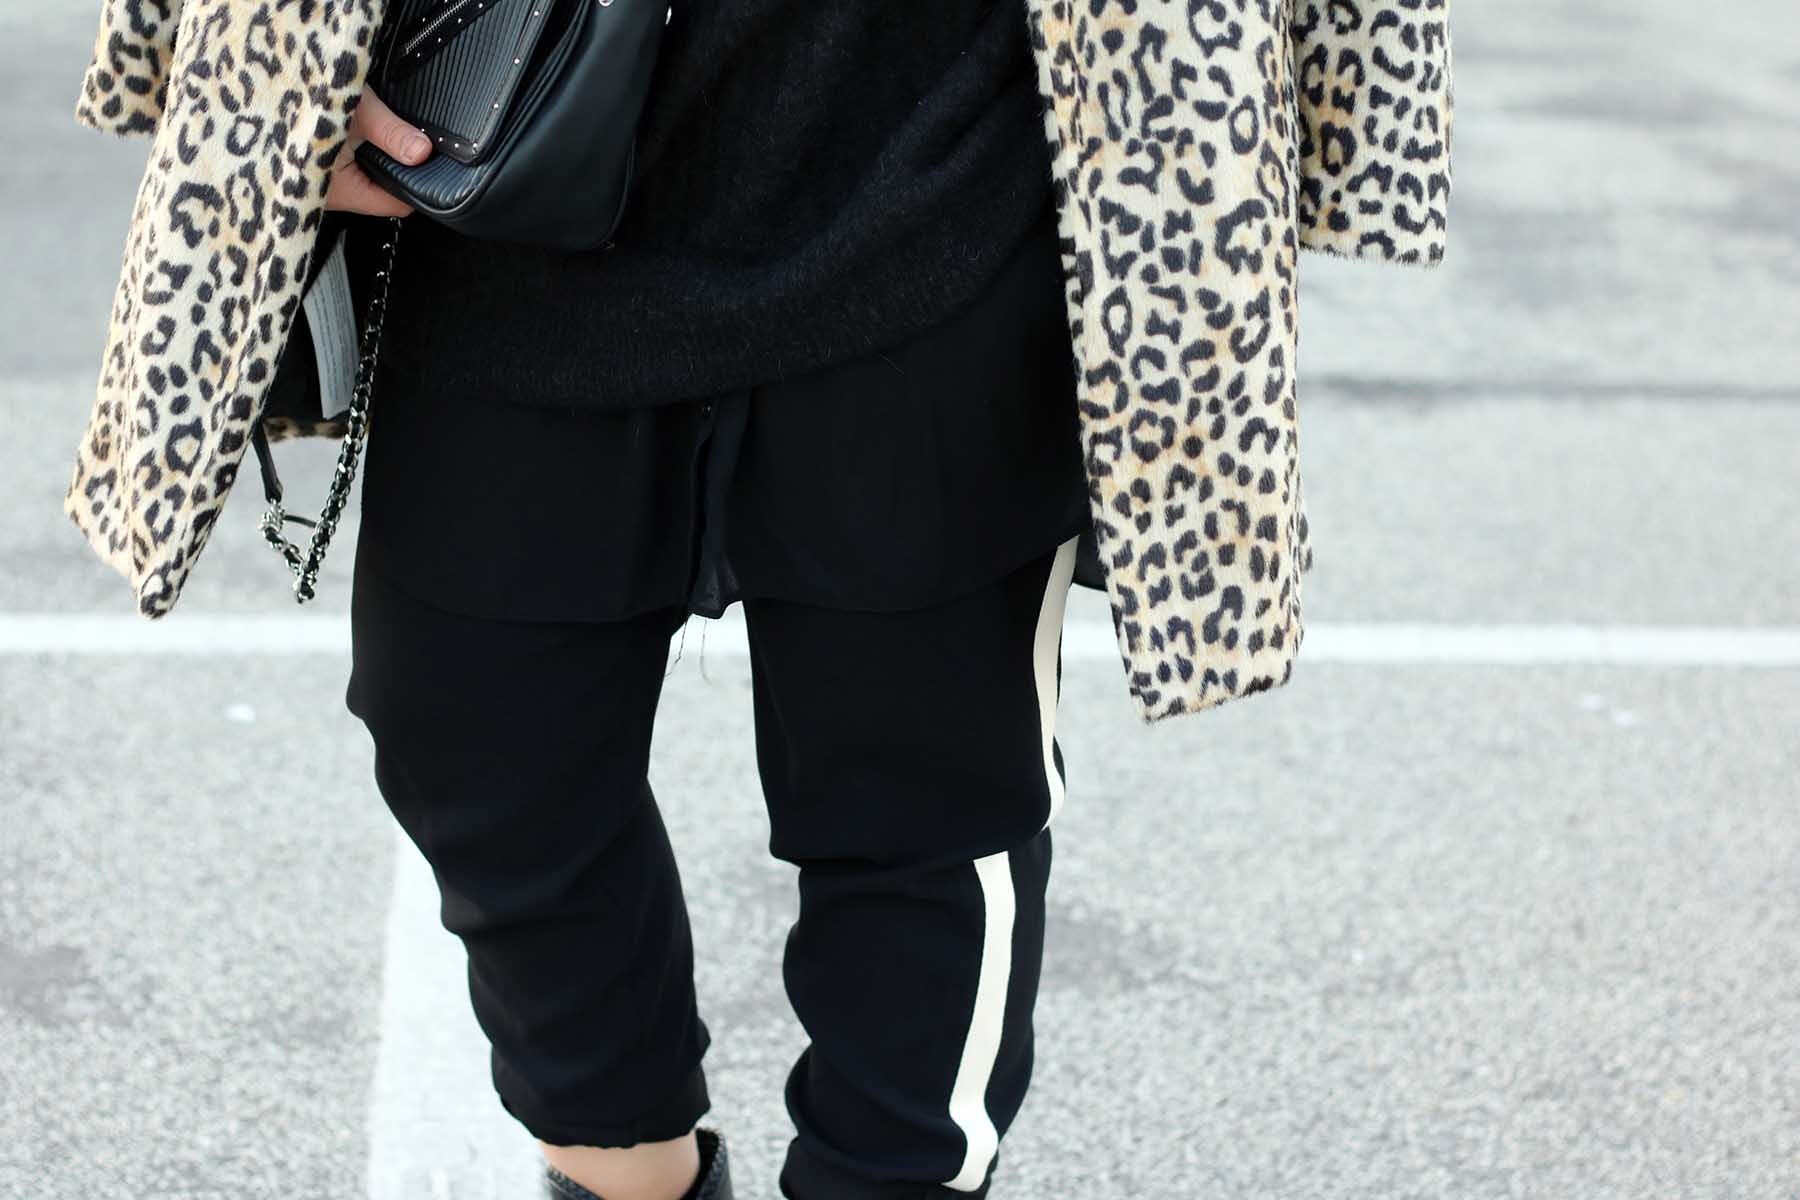 outift-leomantel-mantel-winter-leoparden-modeblog-fashionblog-look-braunschweig17